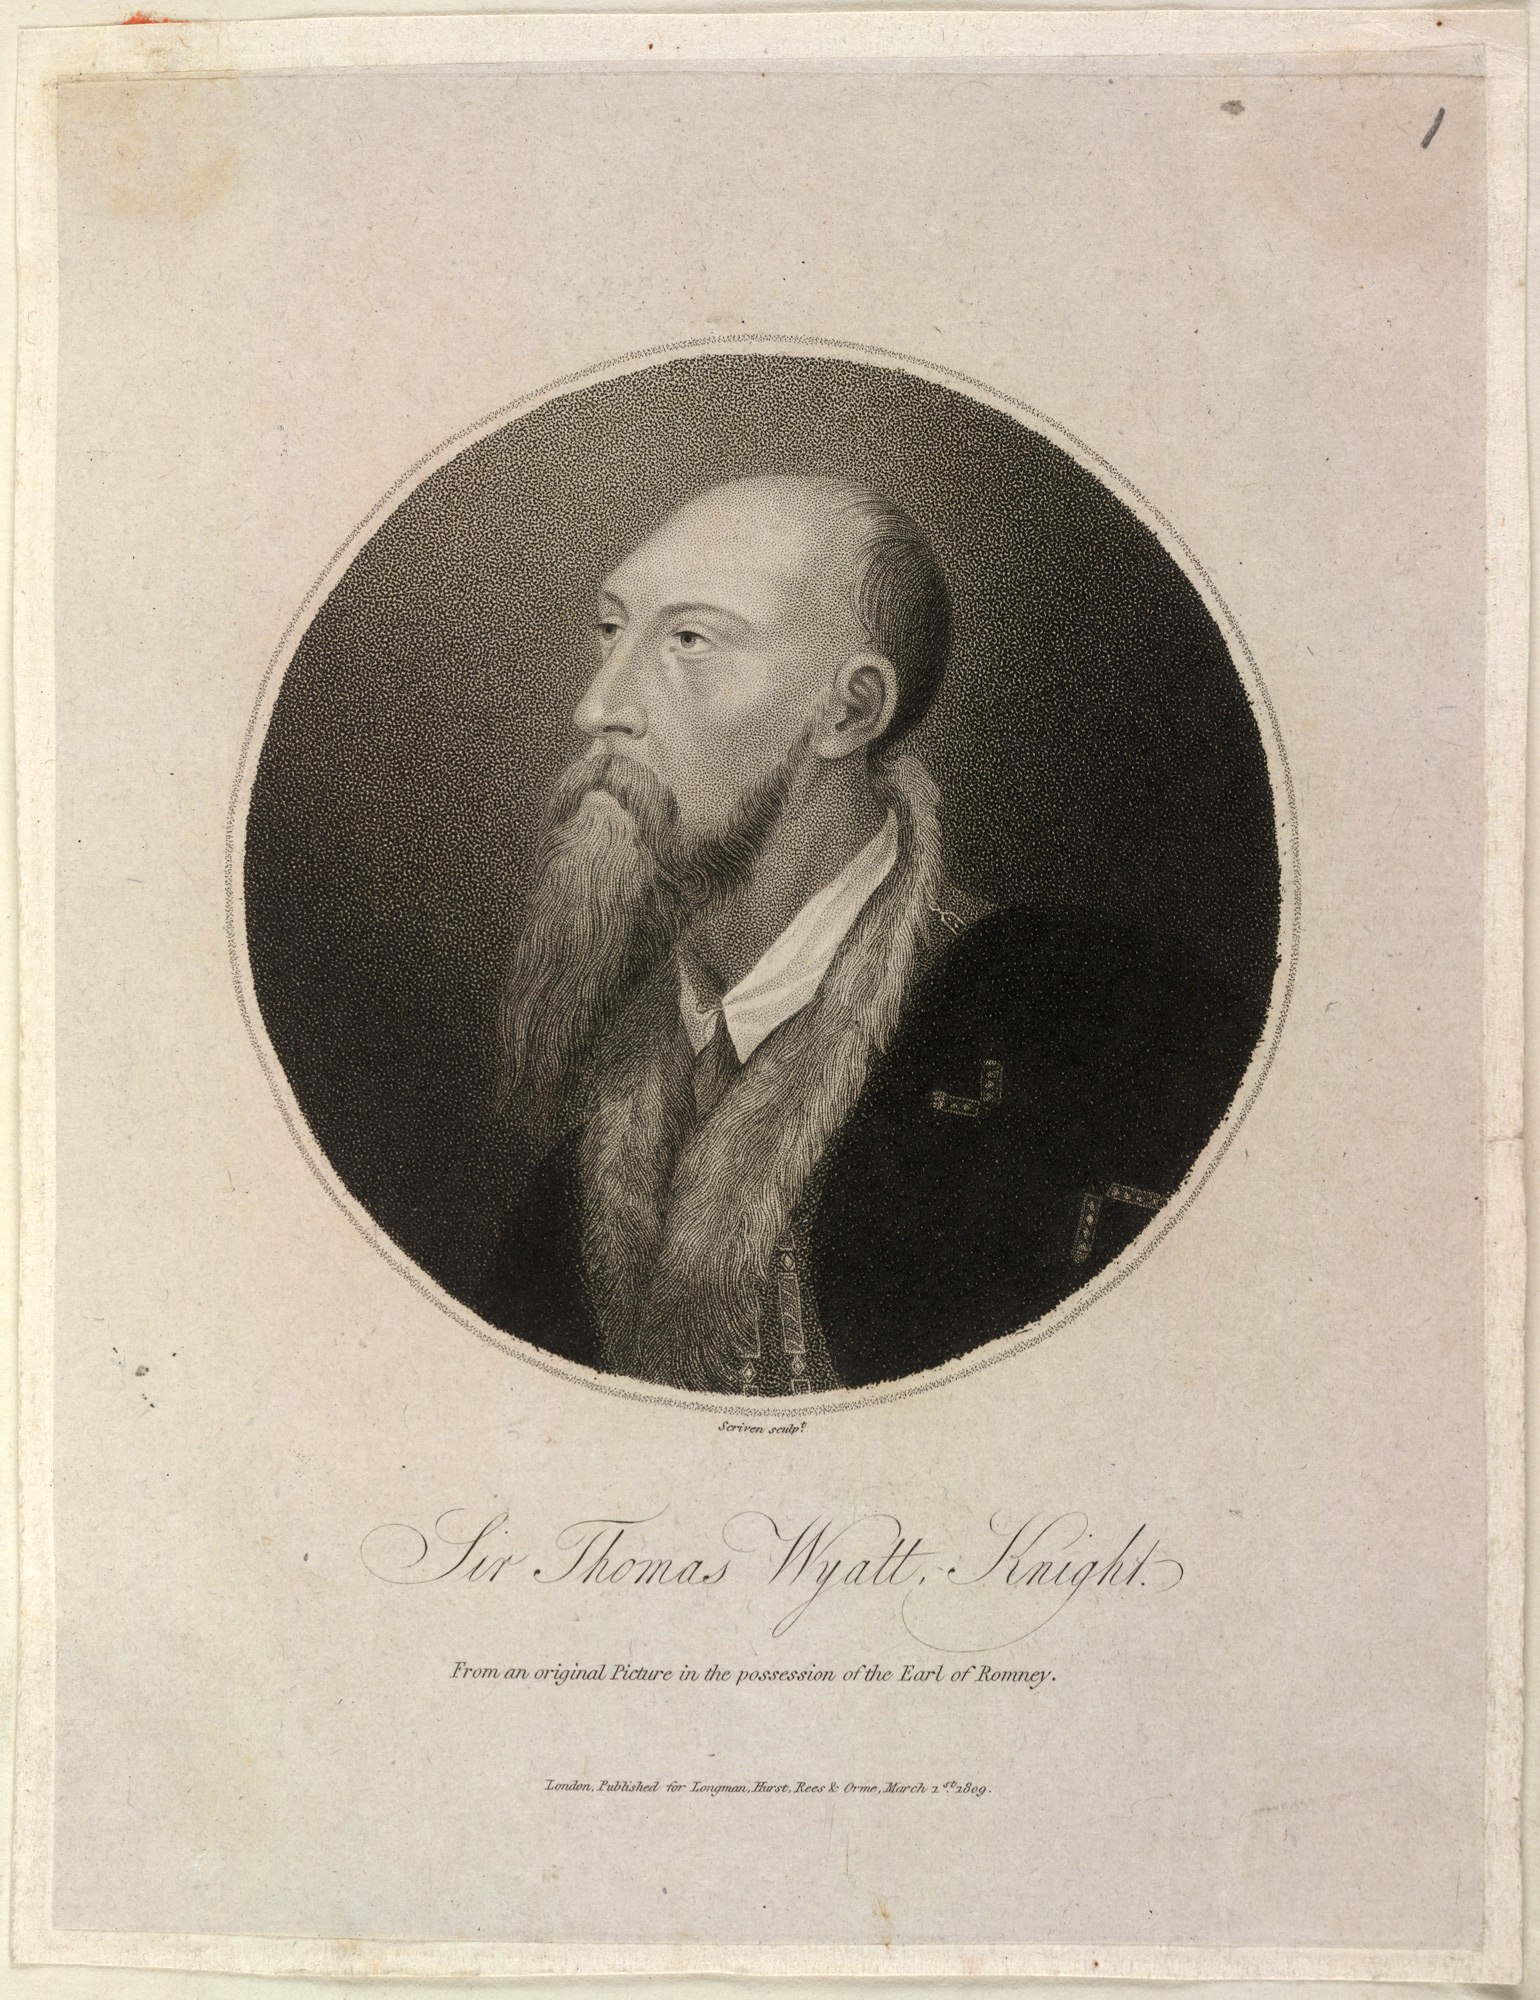 Book of Sir Thomas Wyatt